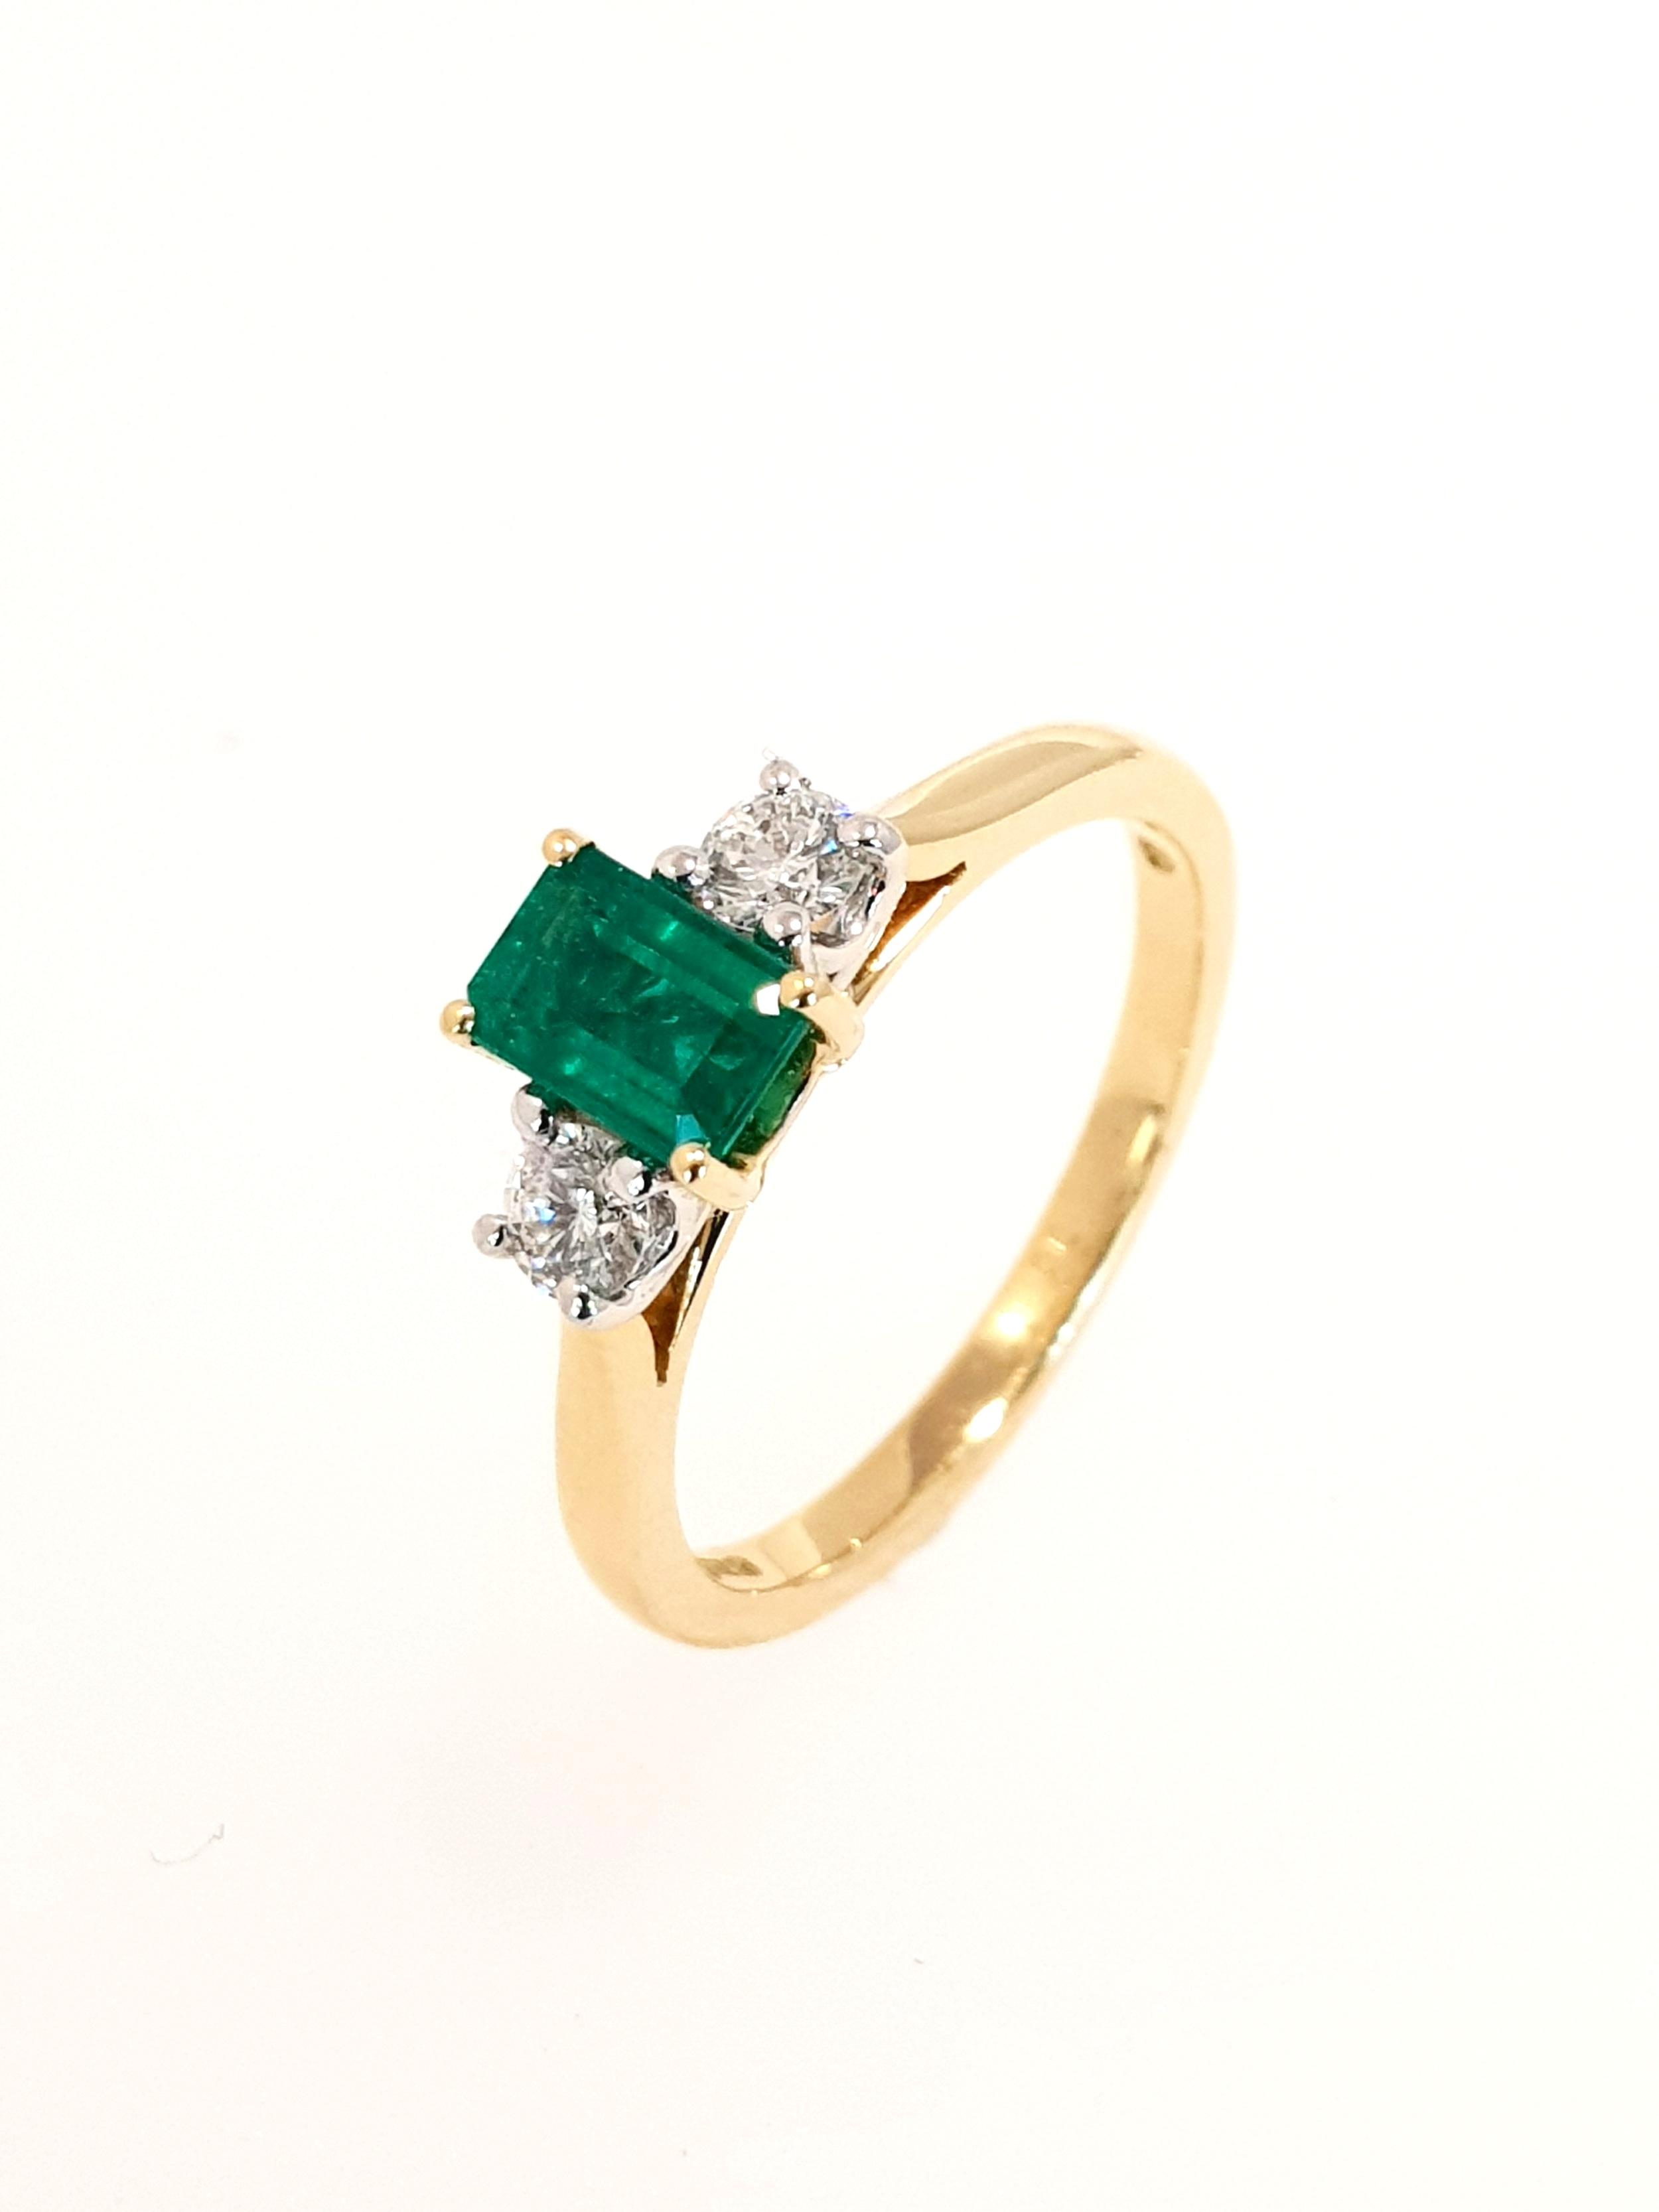 18ct Yellow Gold Emerald(.53ct) & Diamond Ring  Diamond: .23ct, G, Si1  Stock Code: N8986  £2800